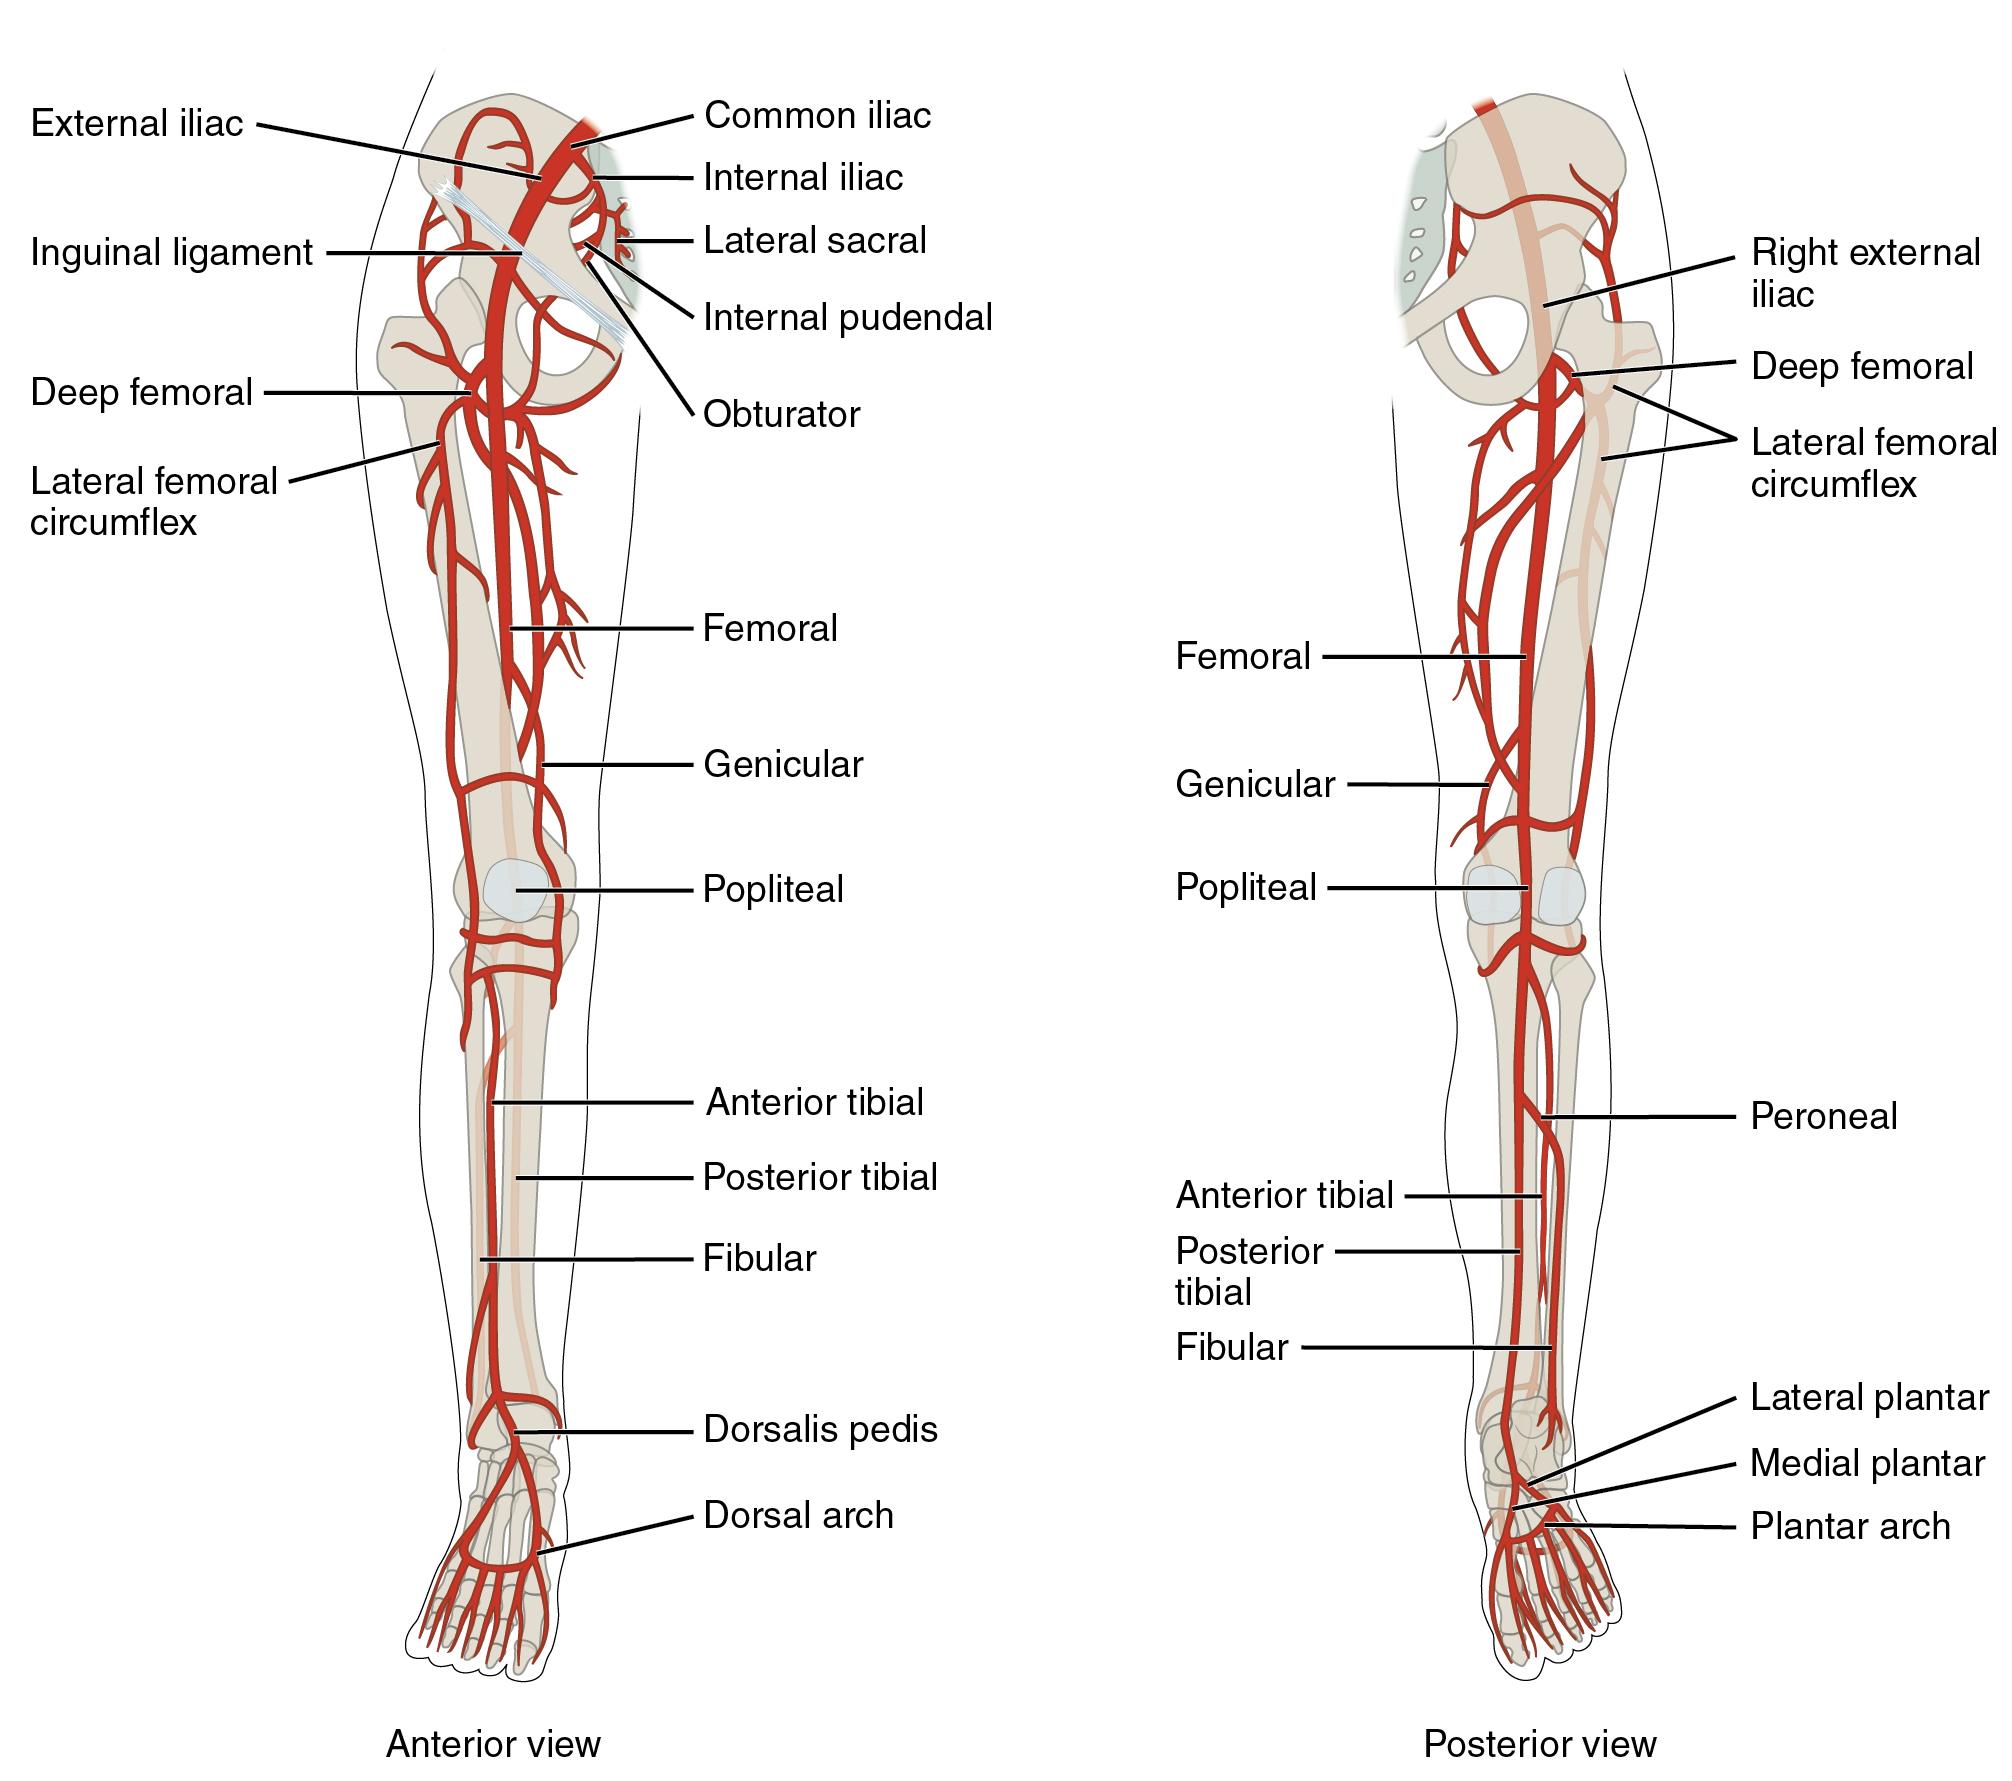 leg-arteries